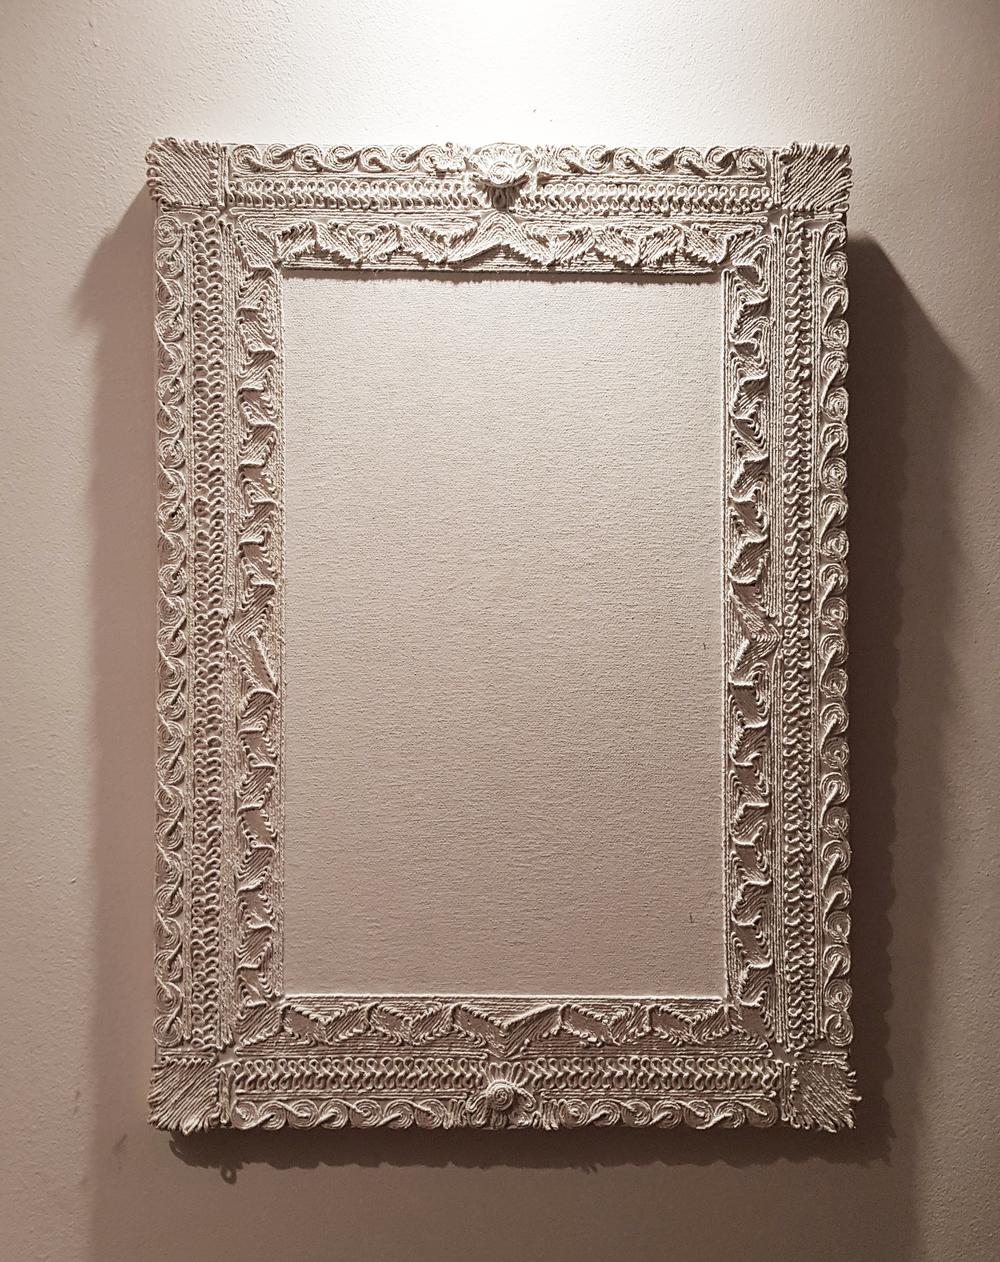 Limites,2014 | Tela, cola branca, barbante | 50 x 70 cm | R$ 6,000